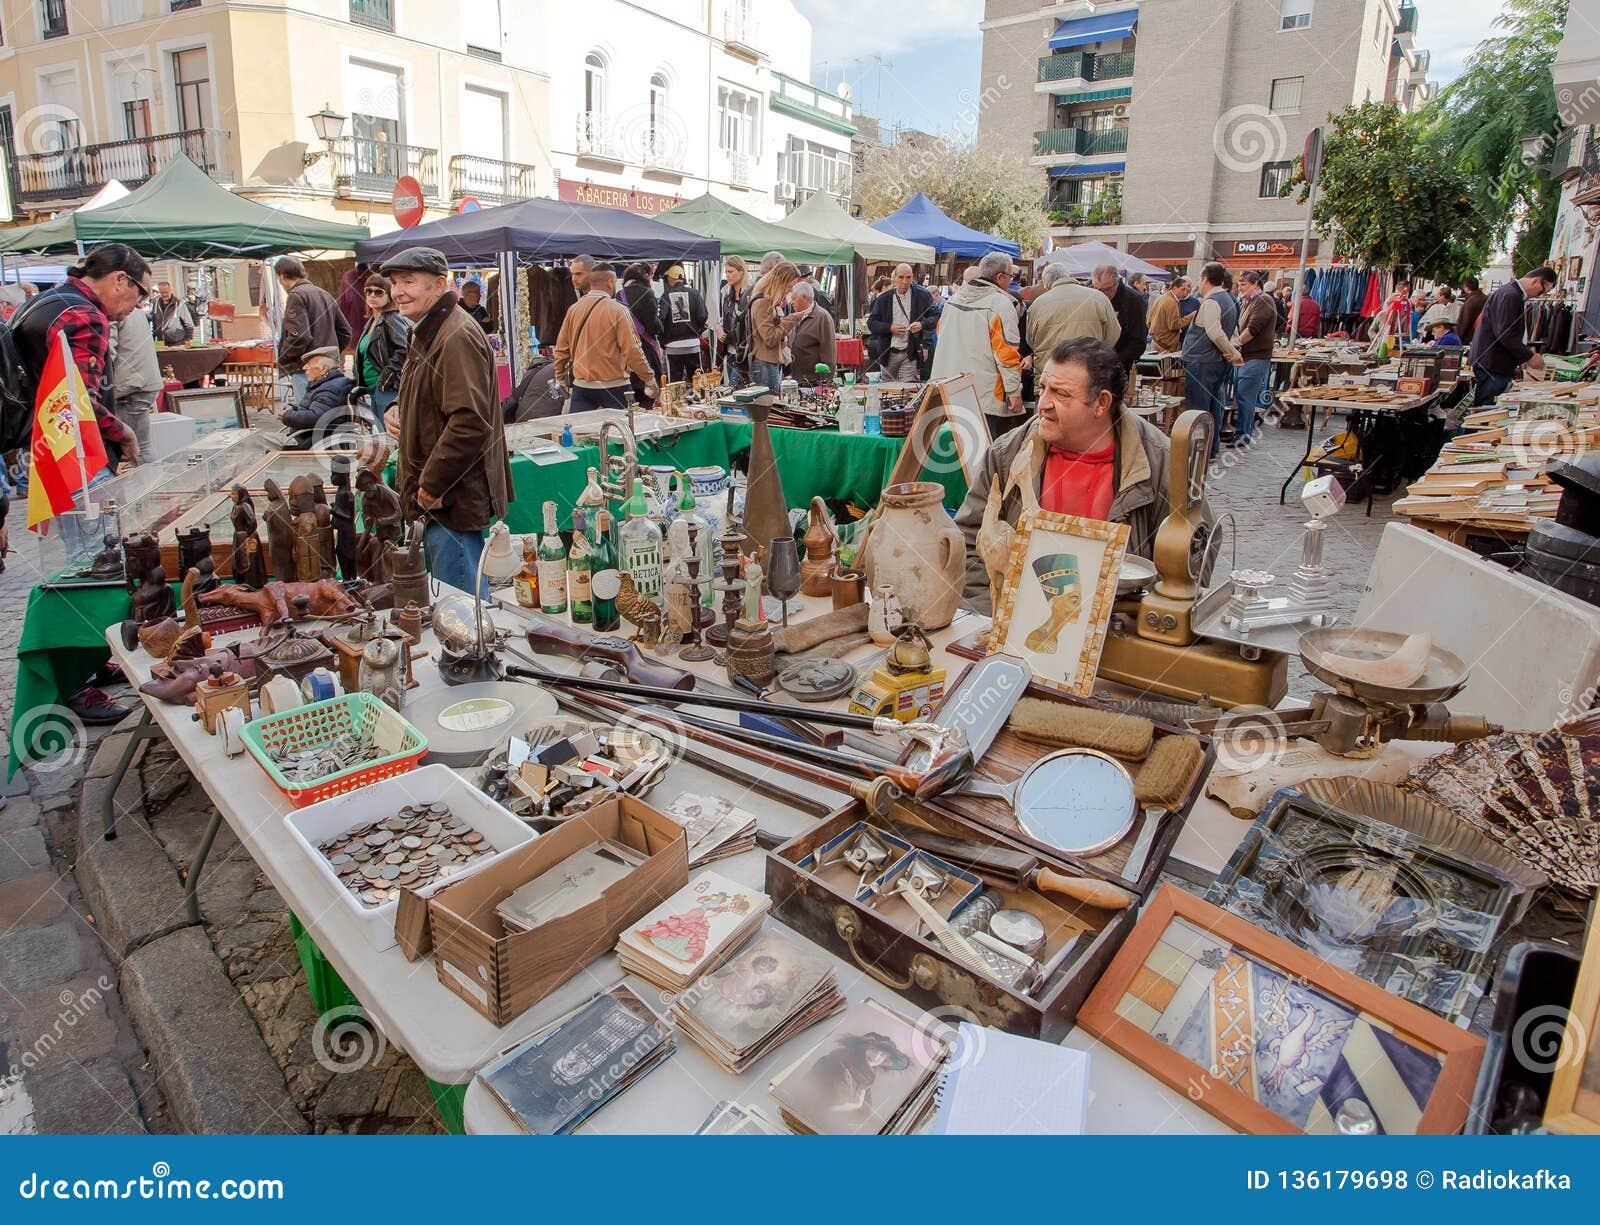 Traders Of Vintage Stuff Old Postacards On The Flea Market